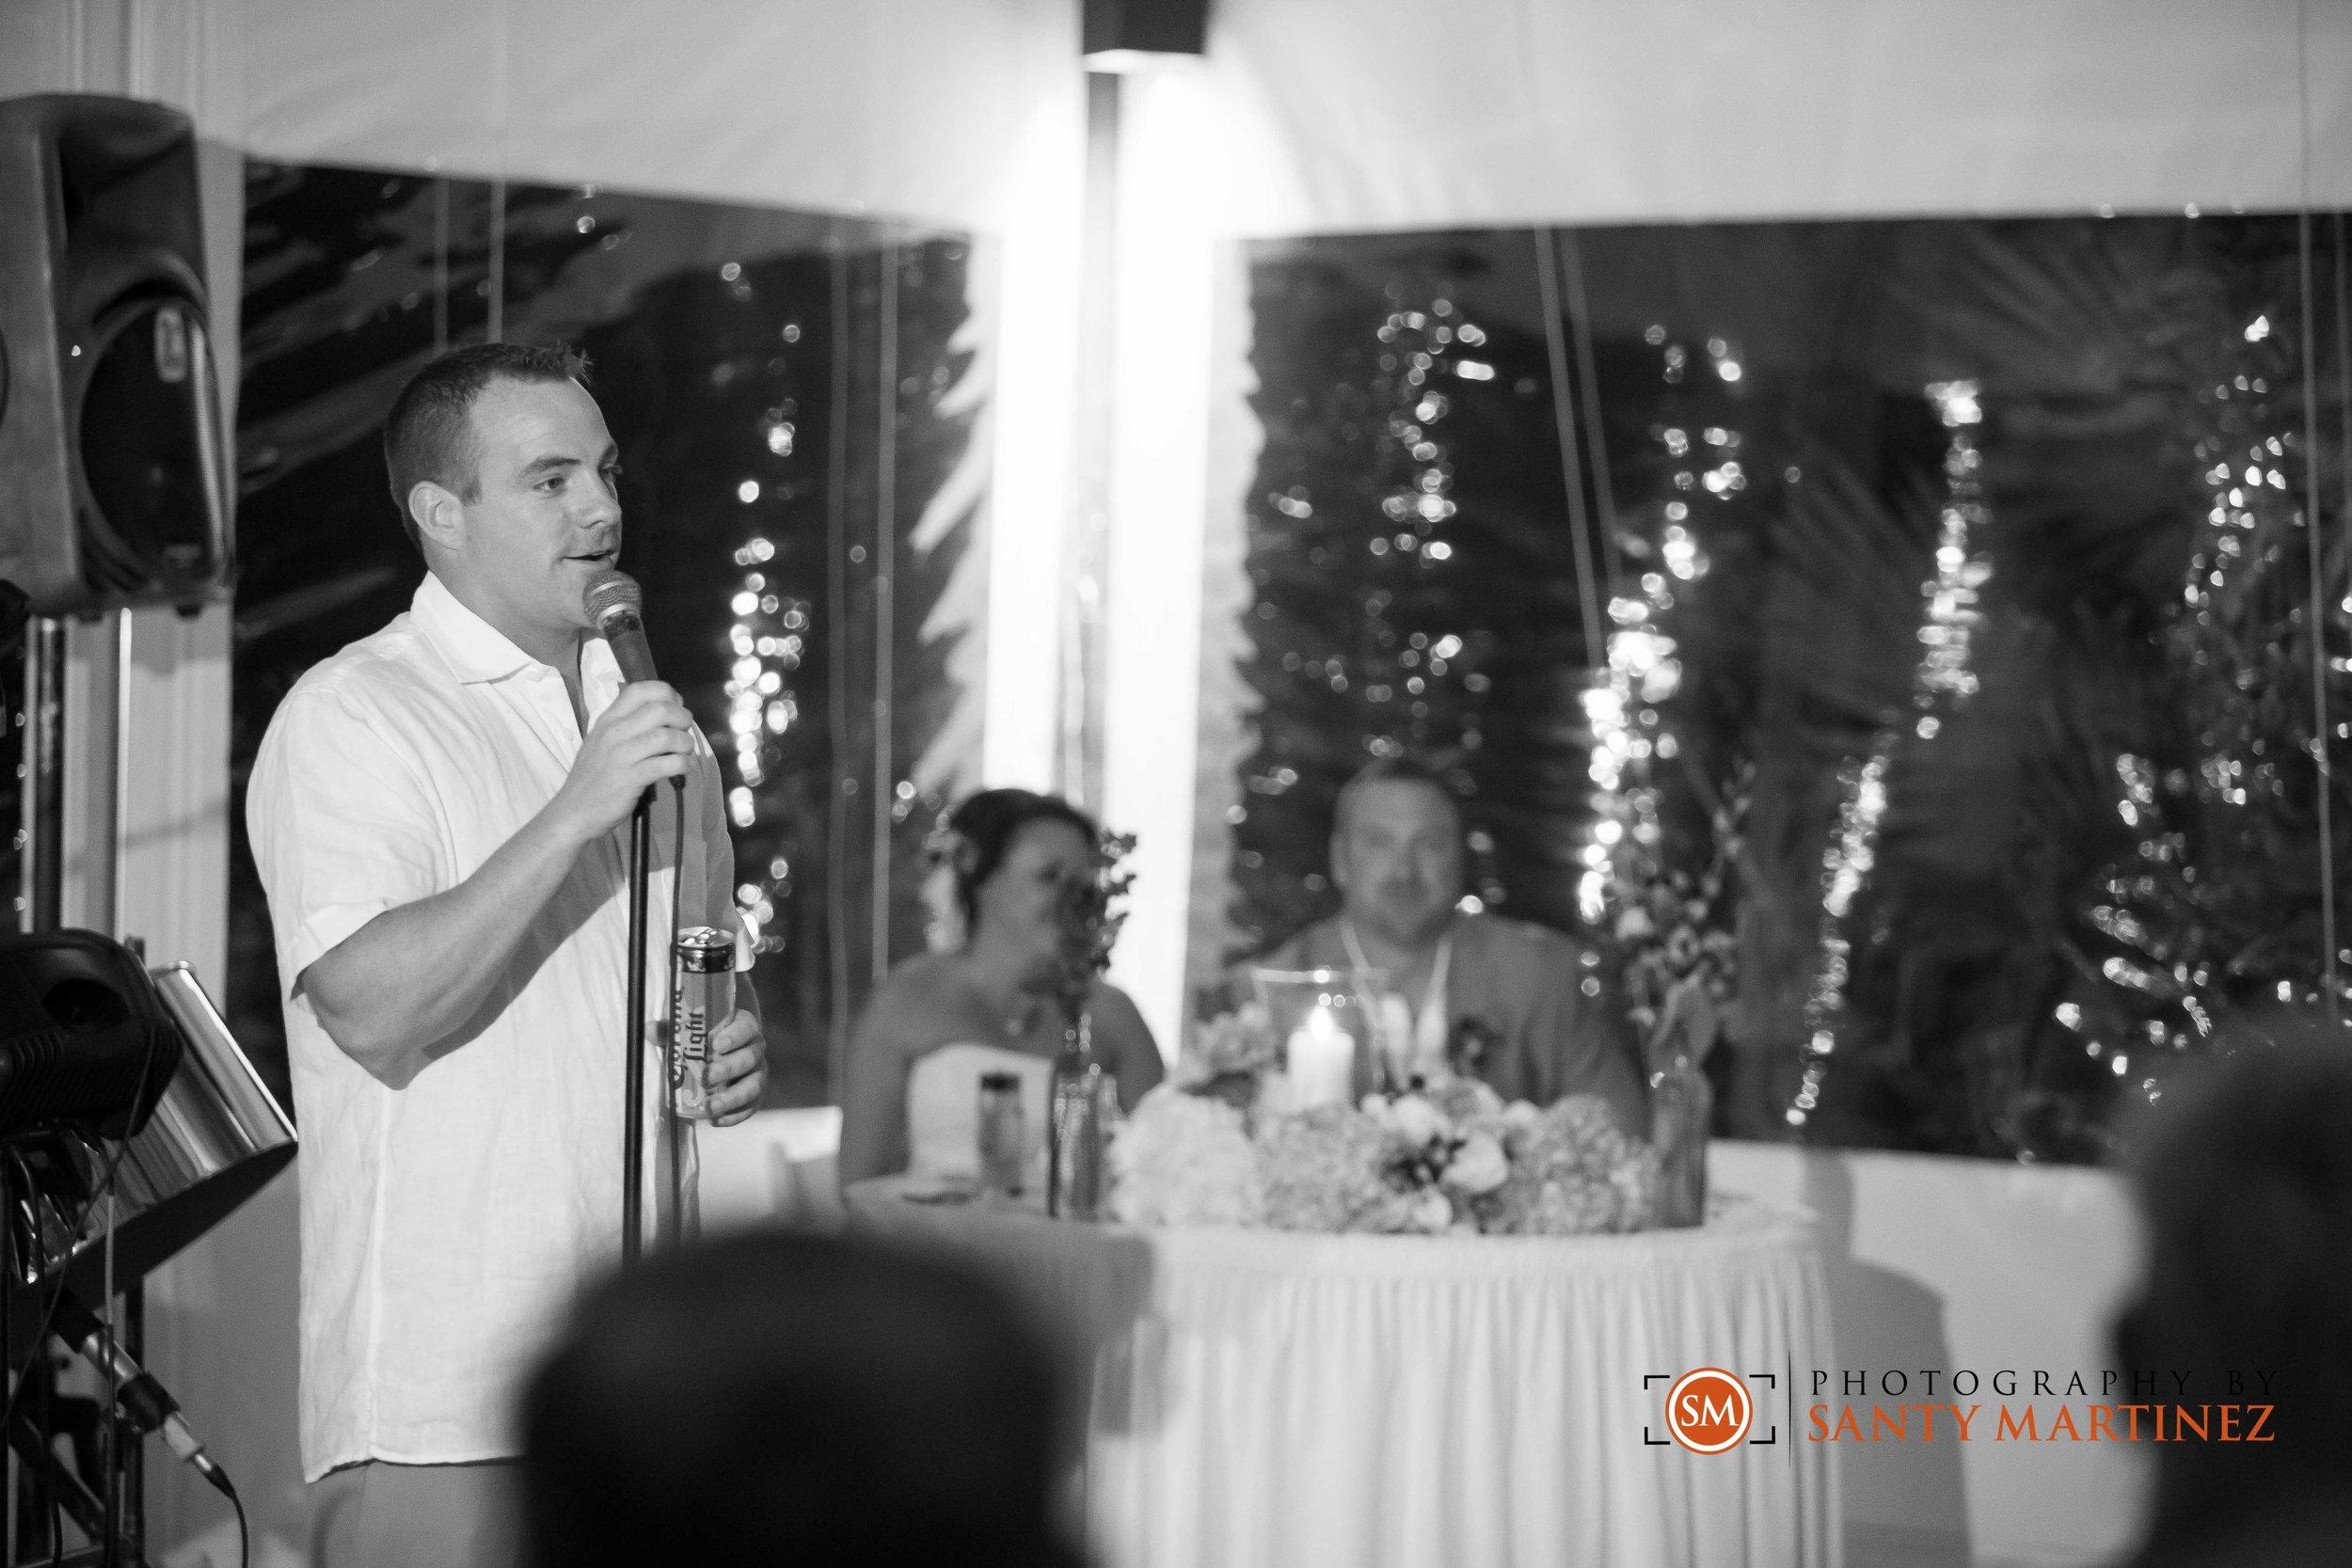 Photography by Santy Martinez - Miami Wedding Photographer-047.jpg